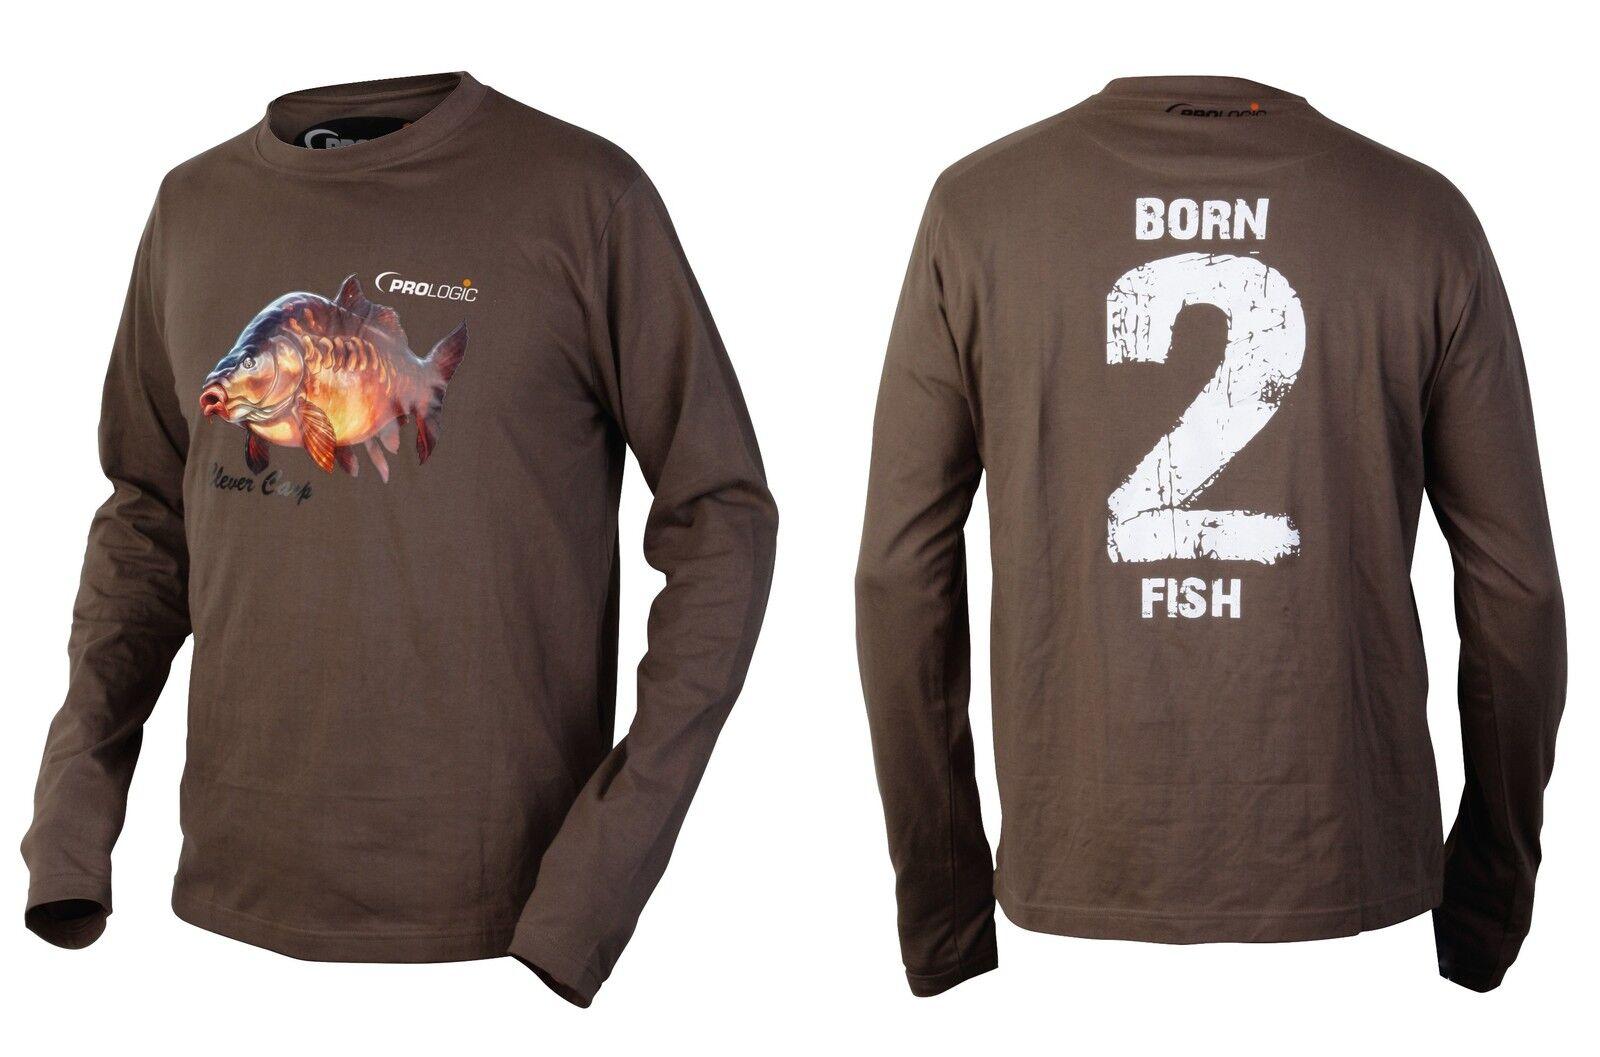 ProLogic born-2-fish Longsleeve Sleeve T-Shirt Size Optional